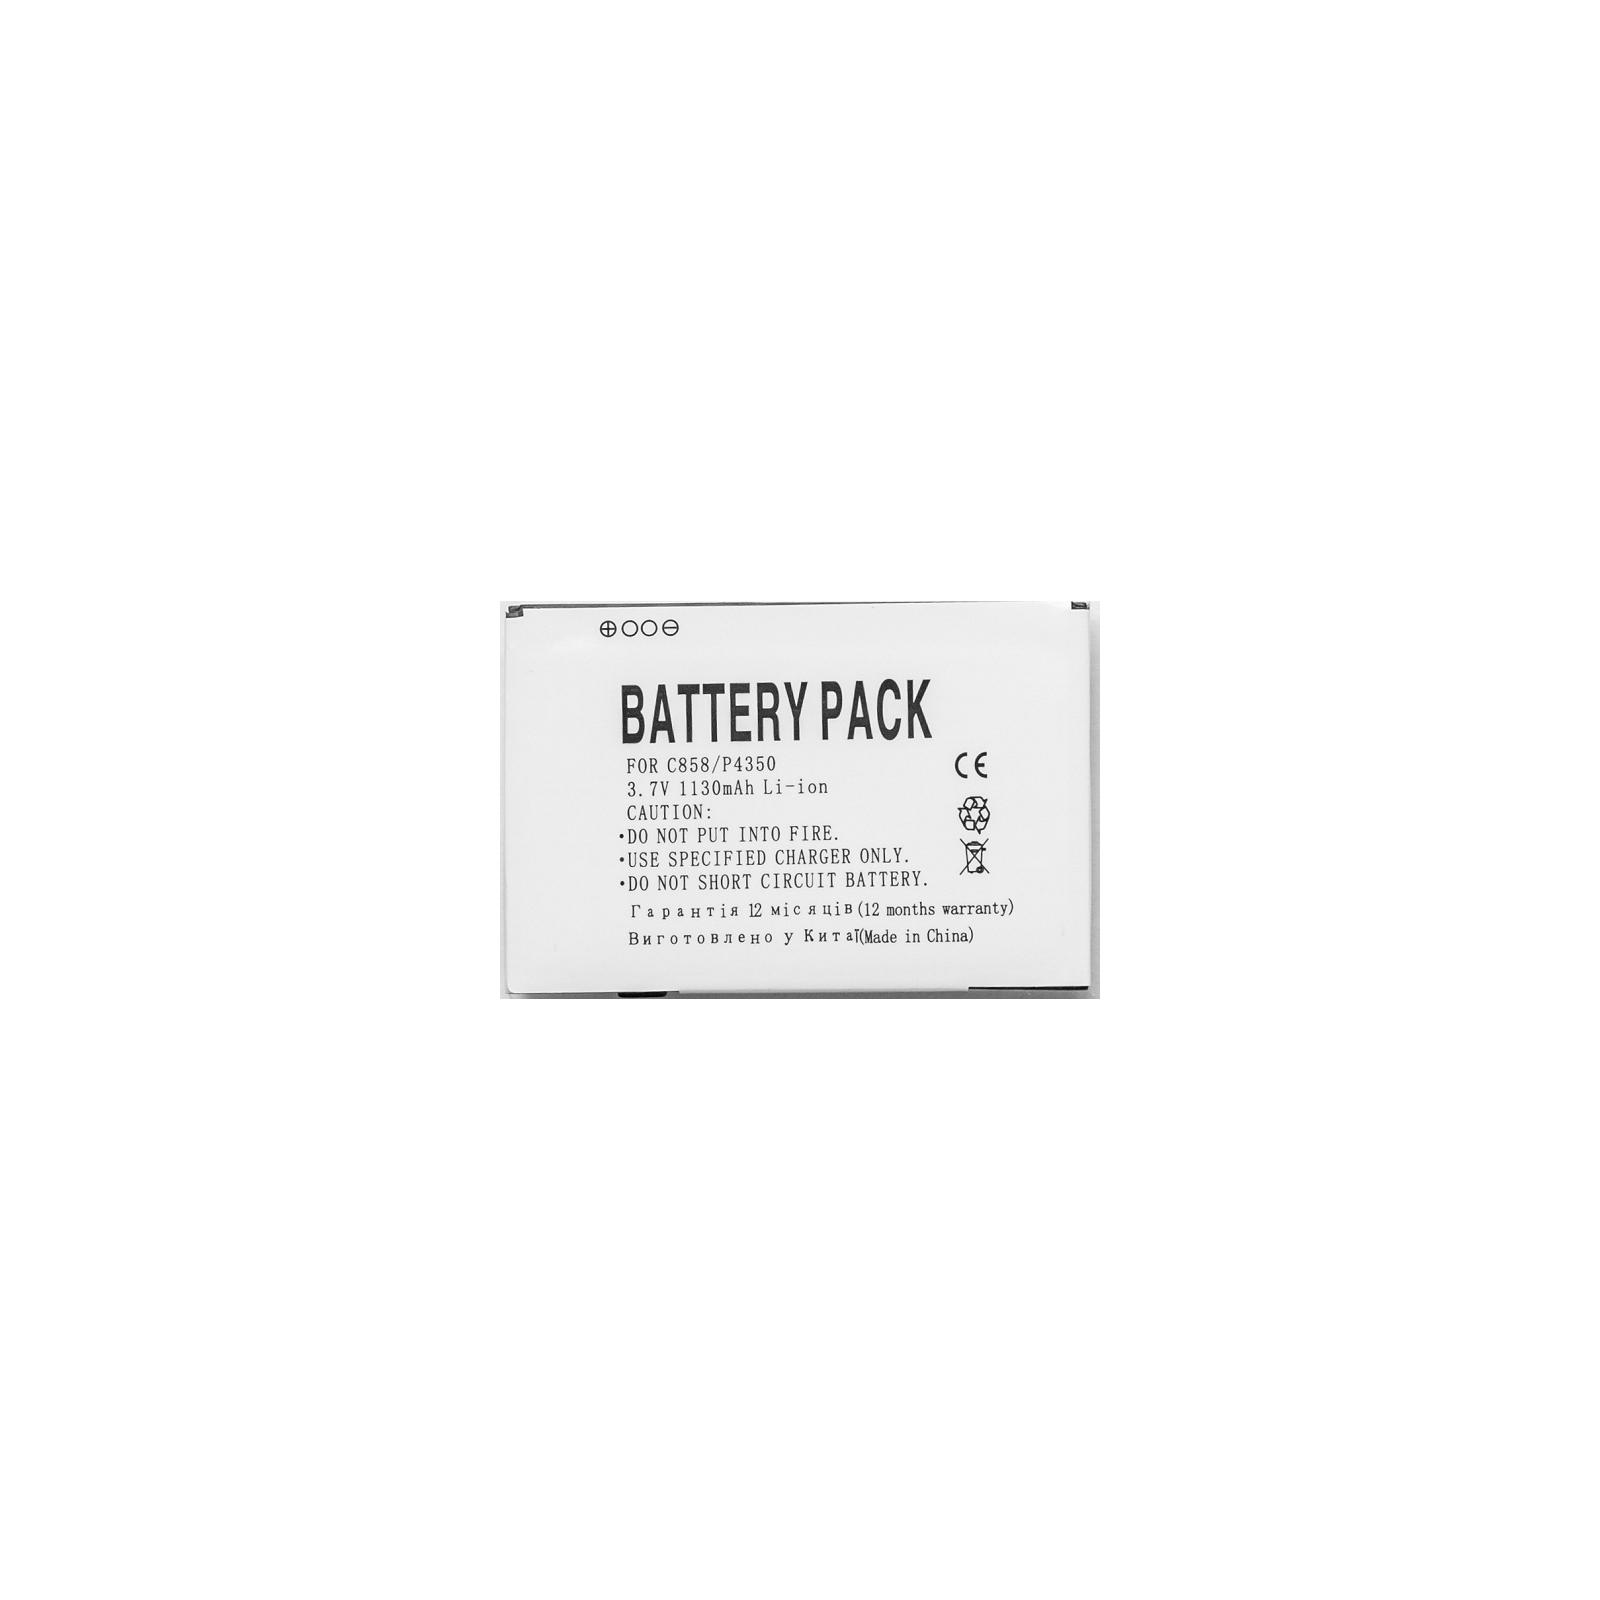 Аккумуляторная батарея PowerPlant HTC HERA160 (P4350, C858, C800, O2 XDA Terra) (DV00DV6159) изображение 2